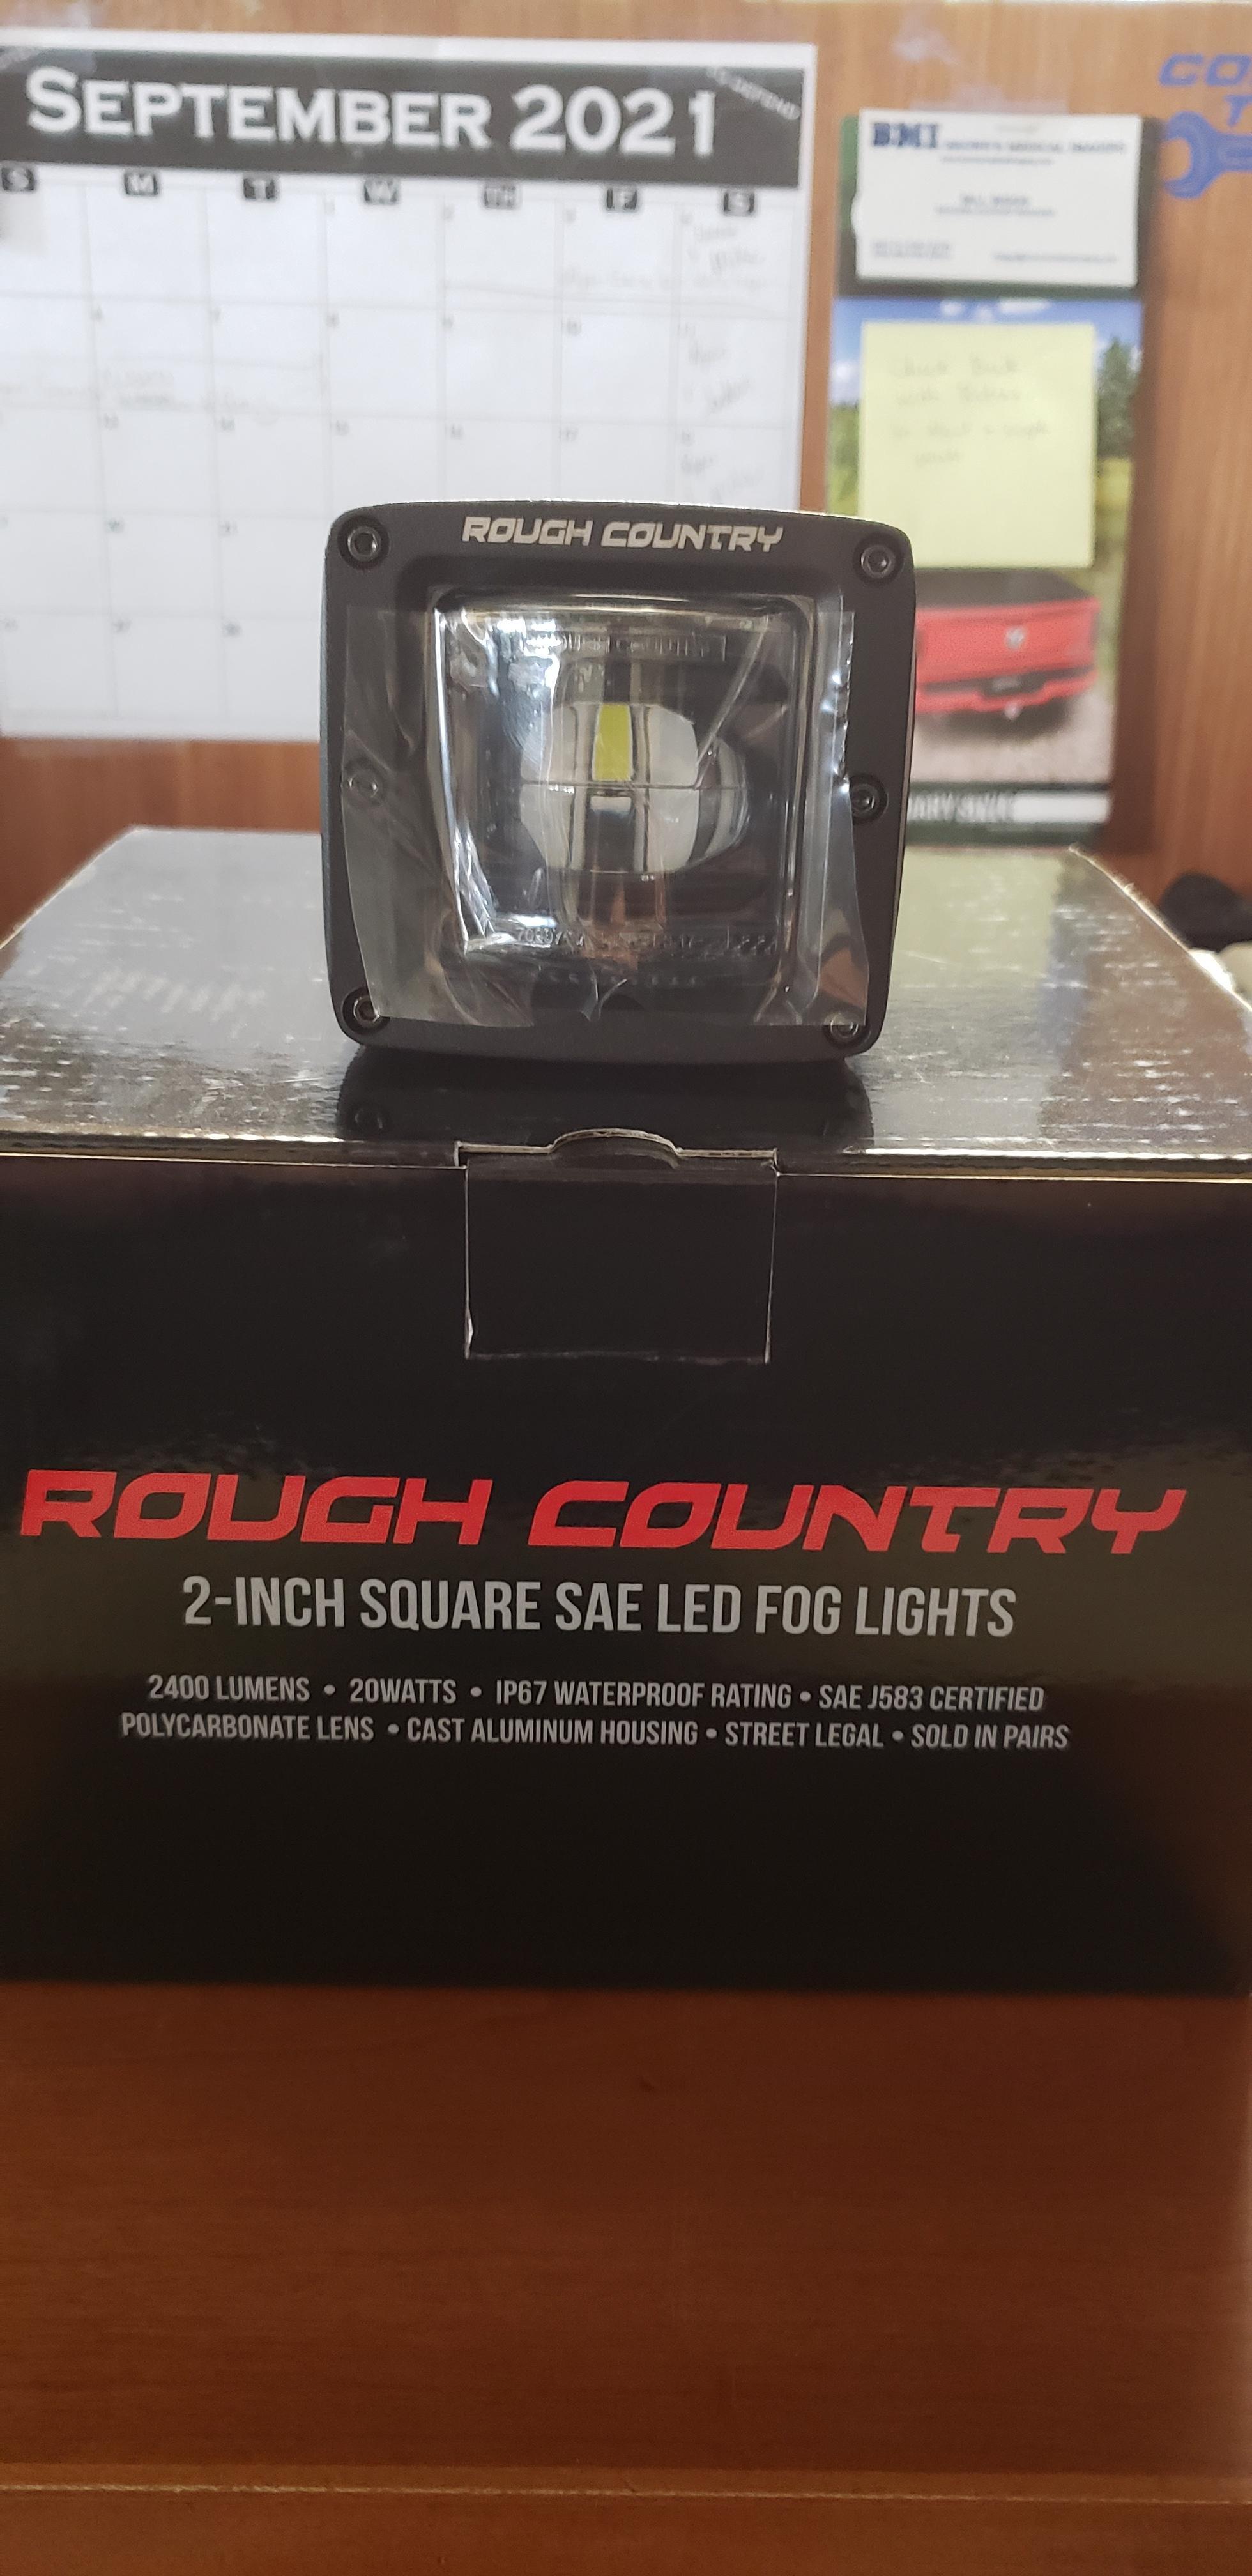 2-inch SQUARE LED SAE FOG LIGHTS